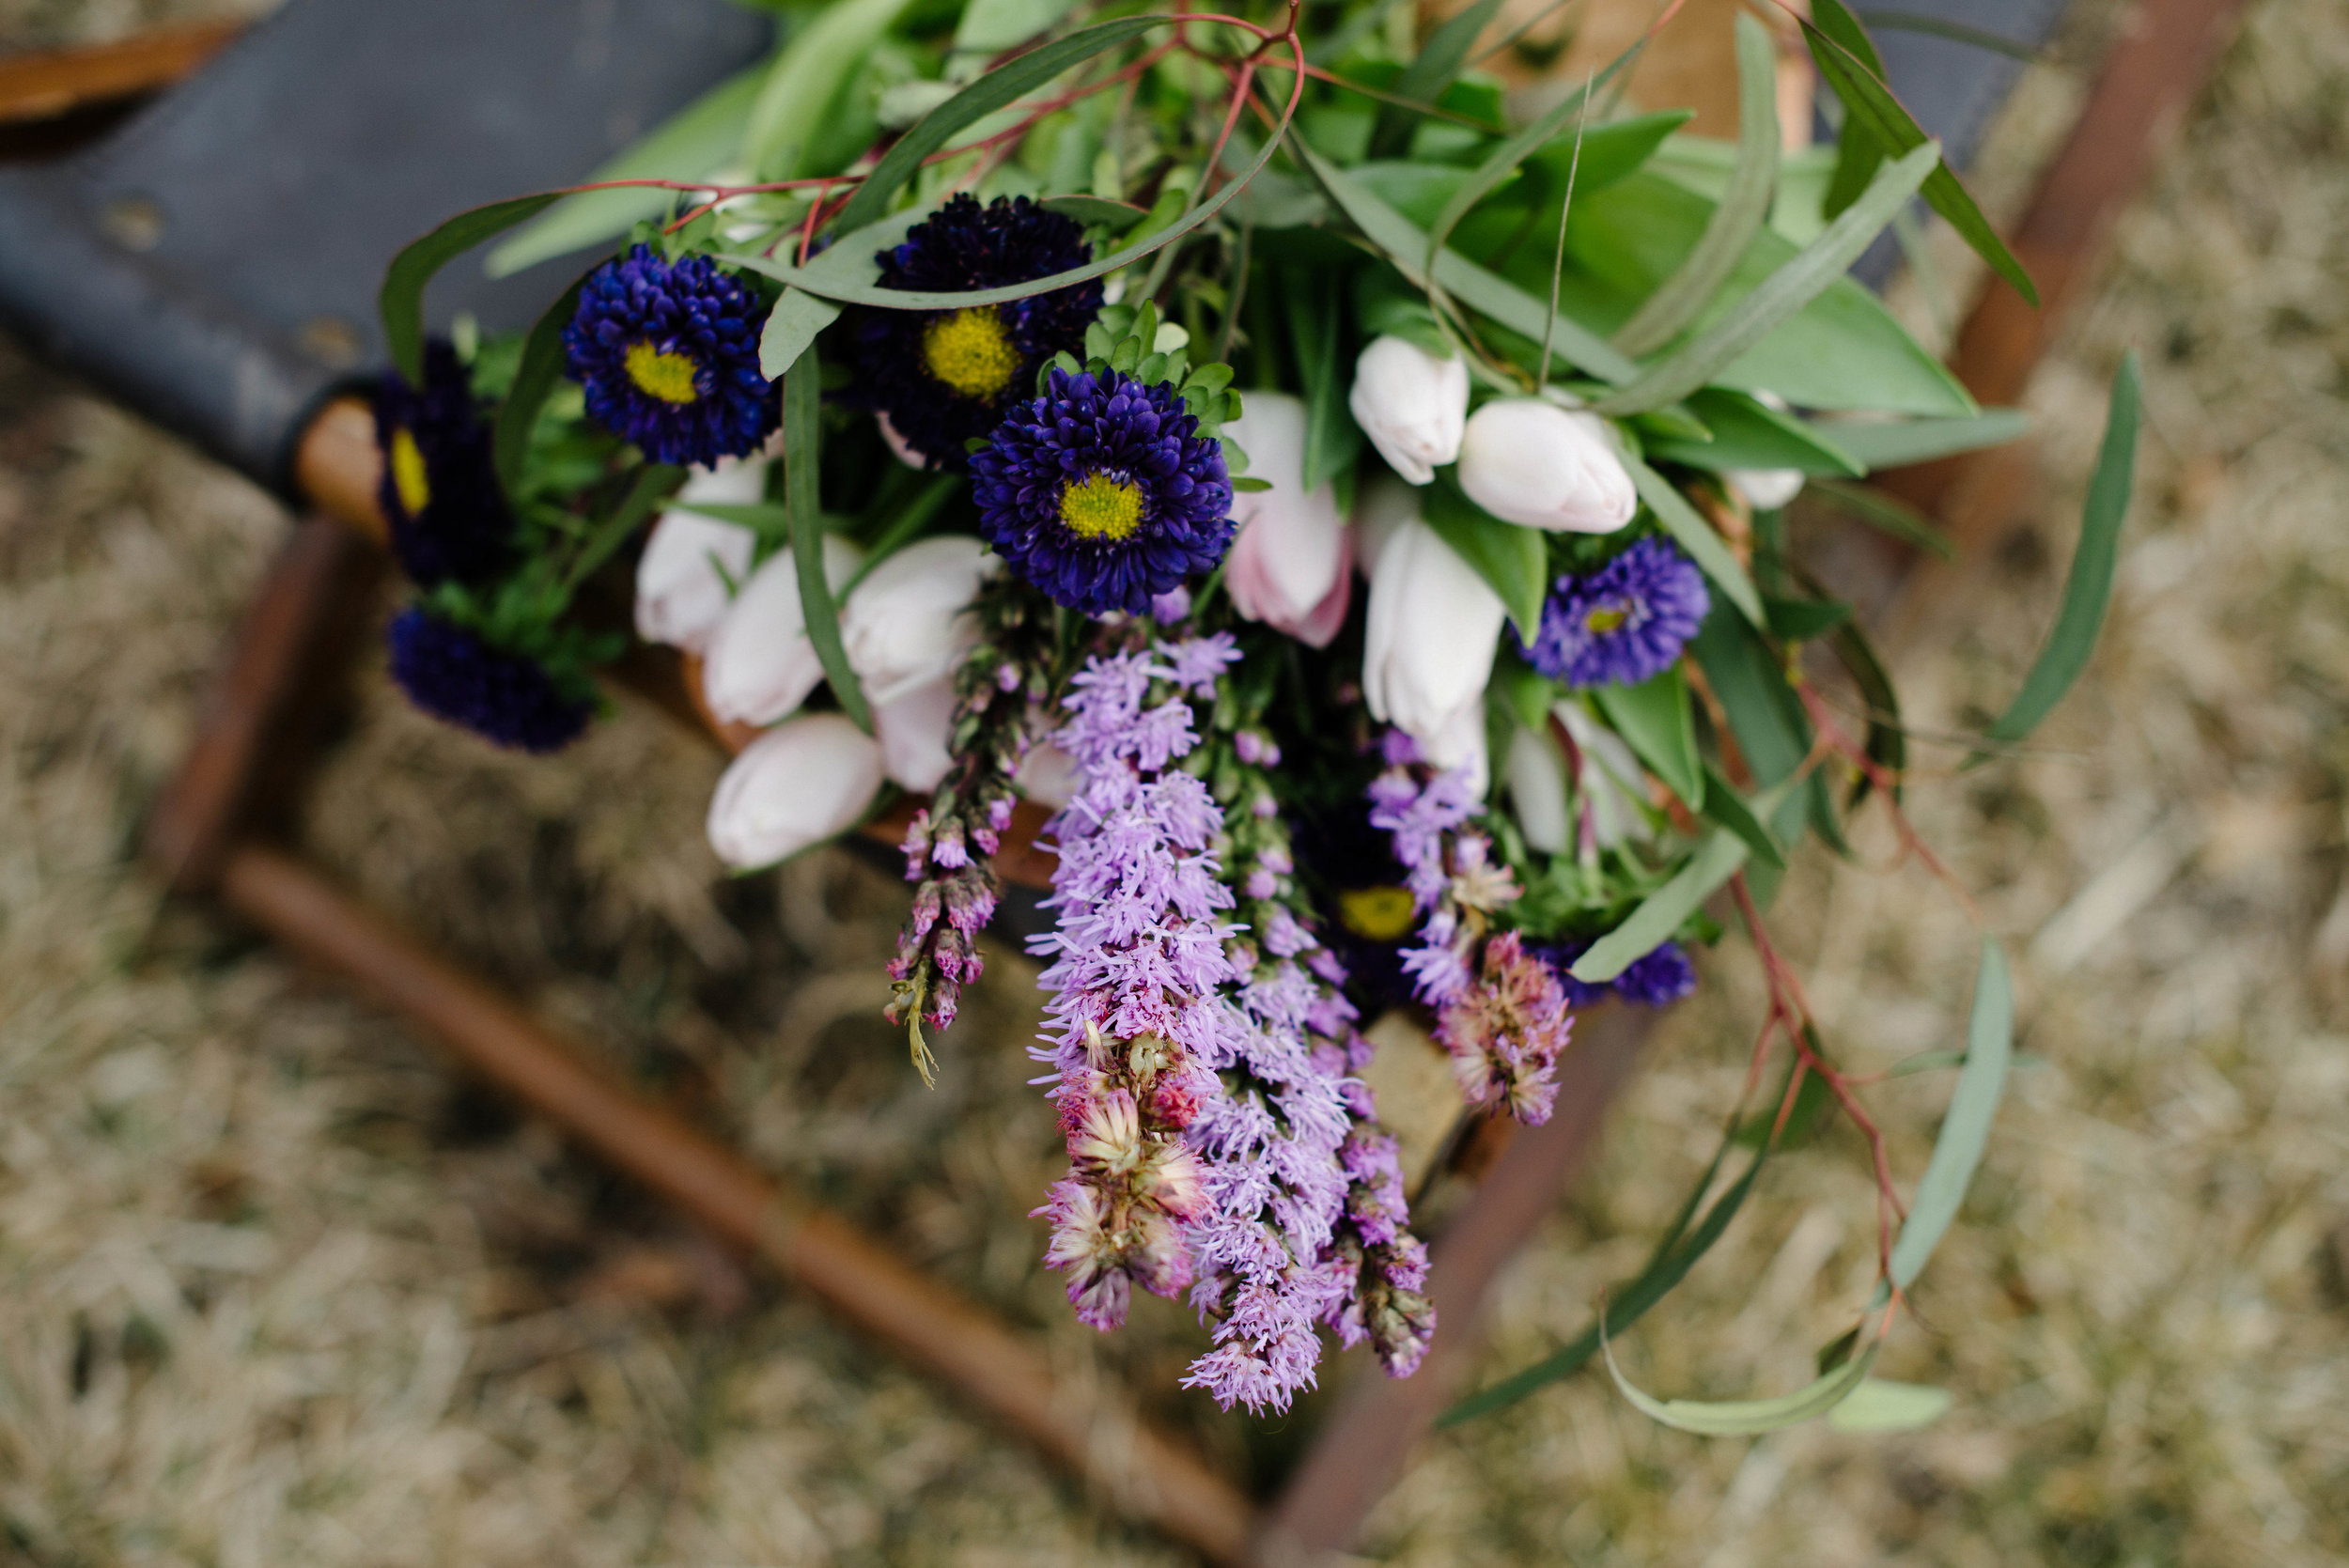 florists in des moines iowa reviews wedding florists west des moines lavender blue boesen something chic